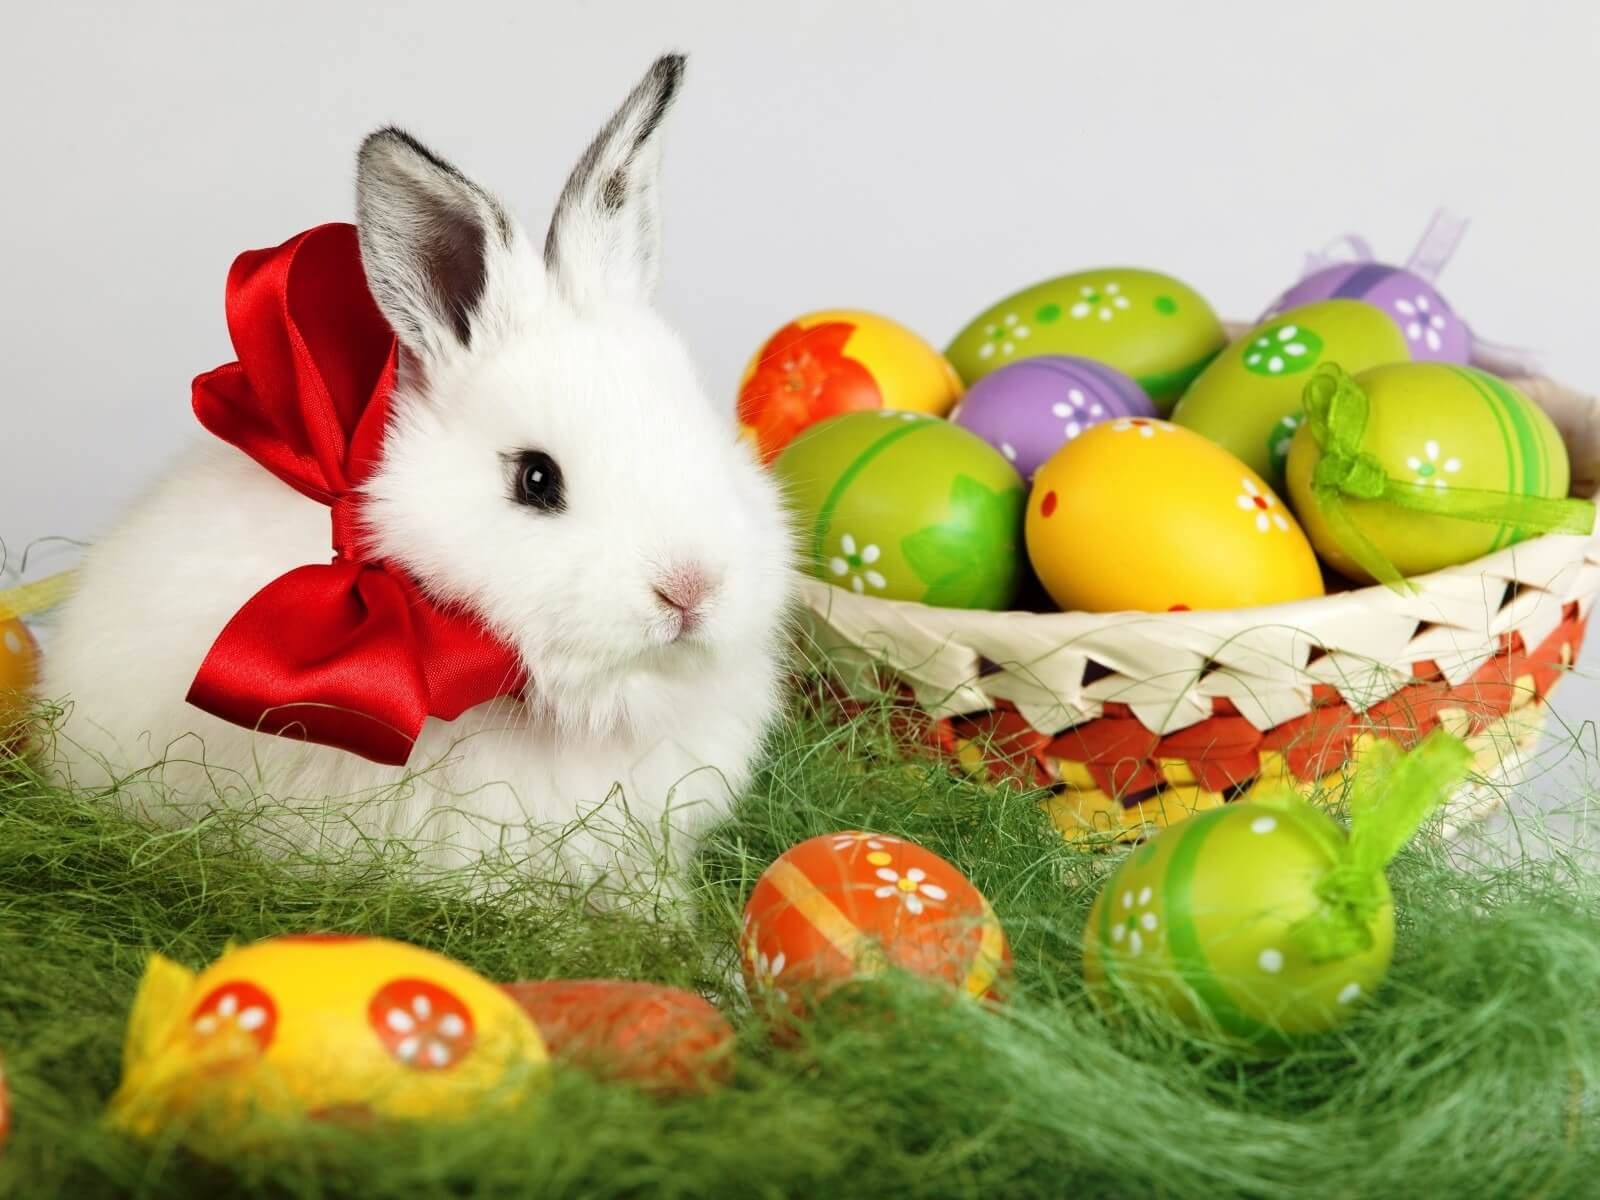 Easter Bunny Rabbit Desktop Wallpaper Free Hd